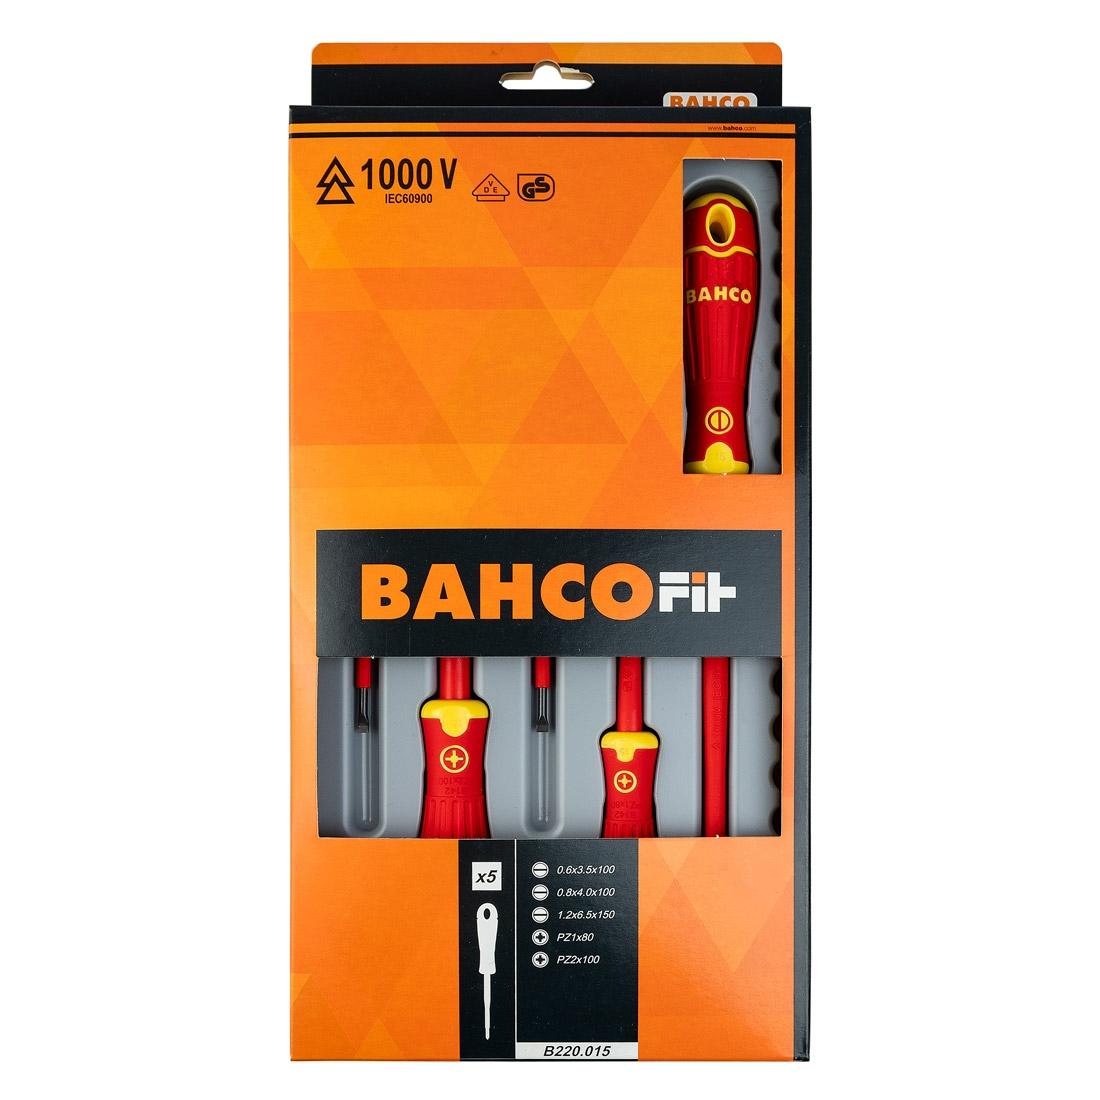 Bahco B220.015 BAHCOFIT Insulated PZ/SL Screwdriver Set 5 Pcs